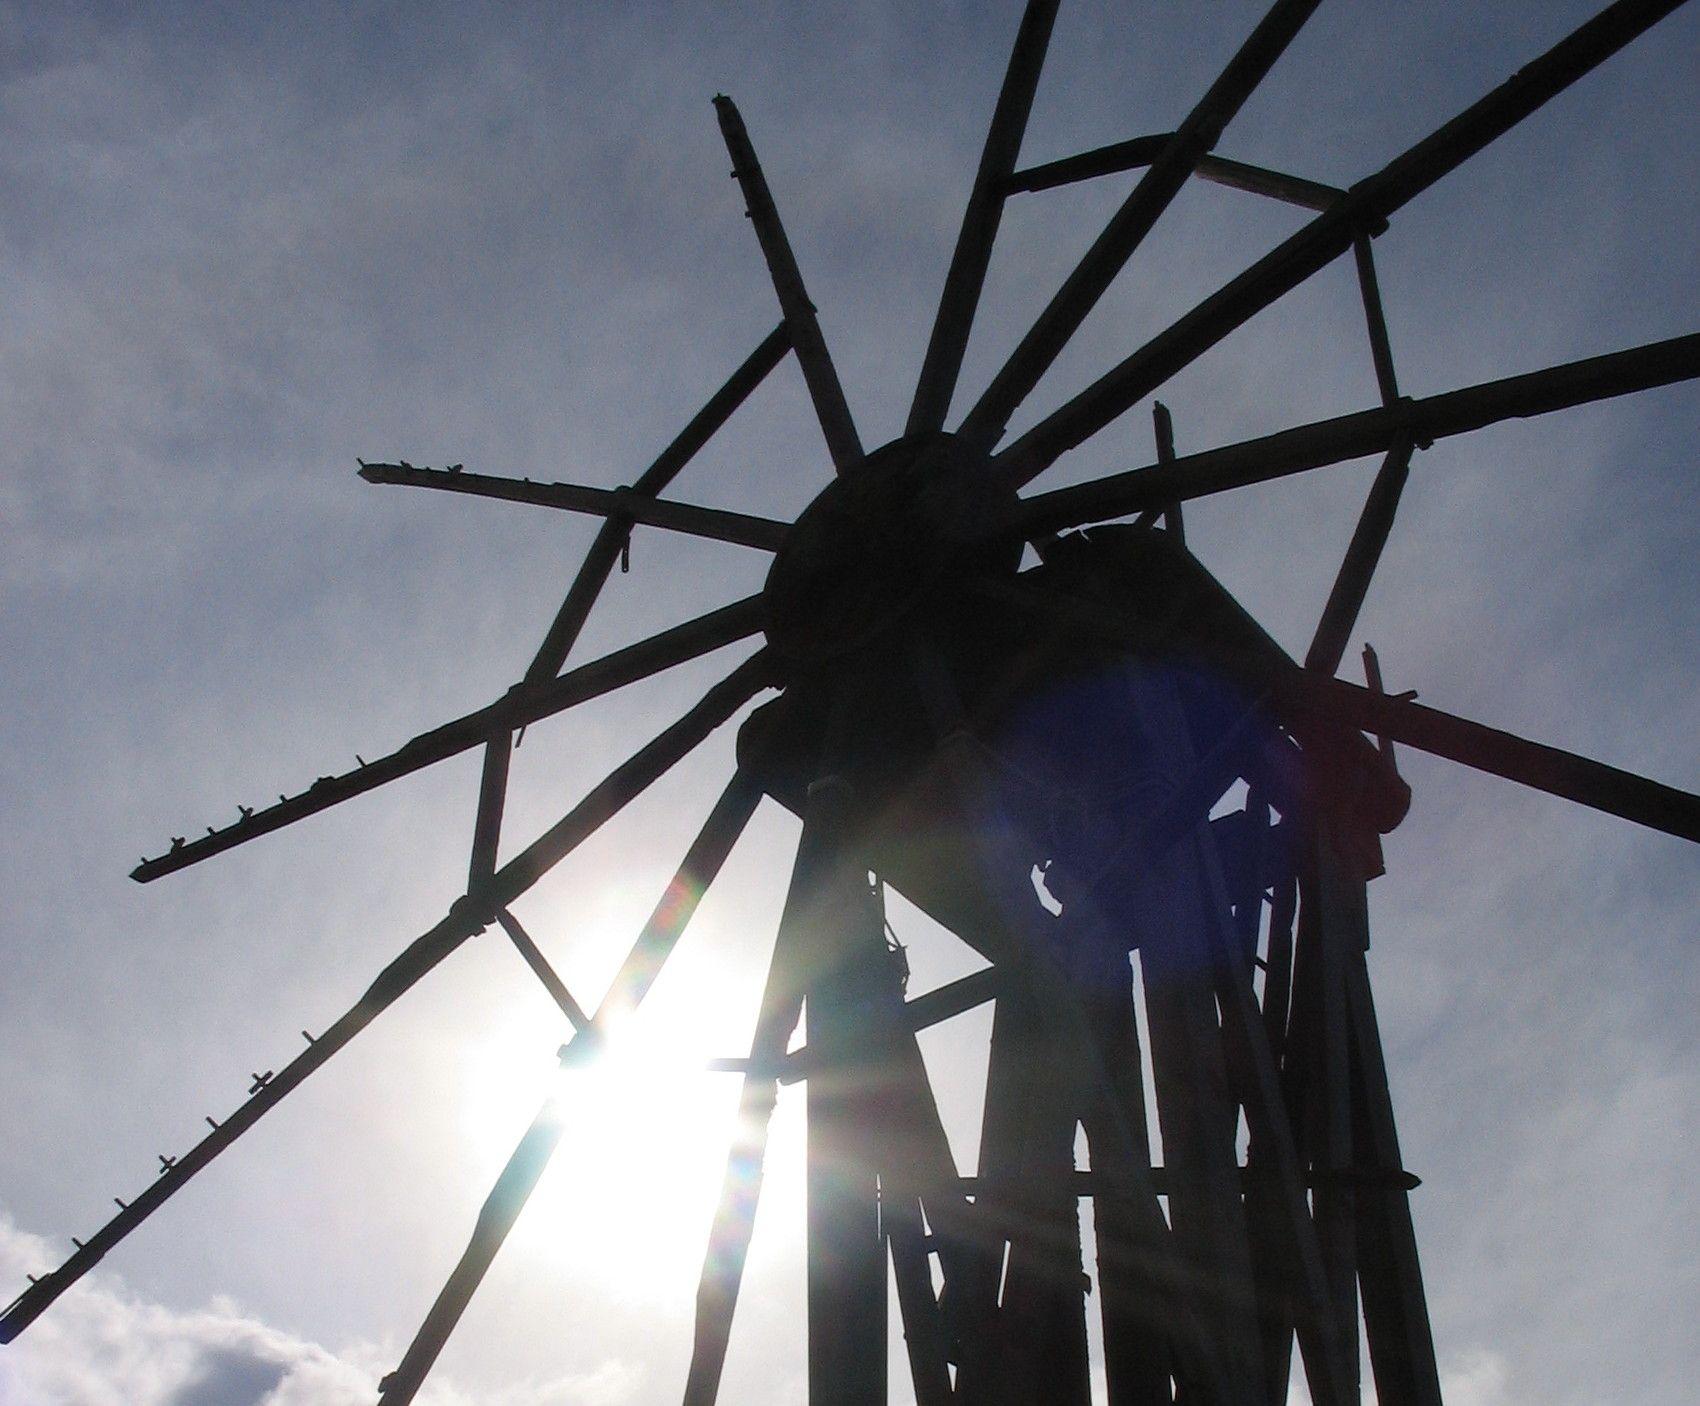 one of several windmills  in garafia